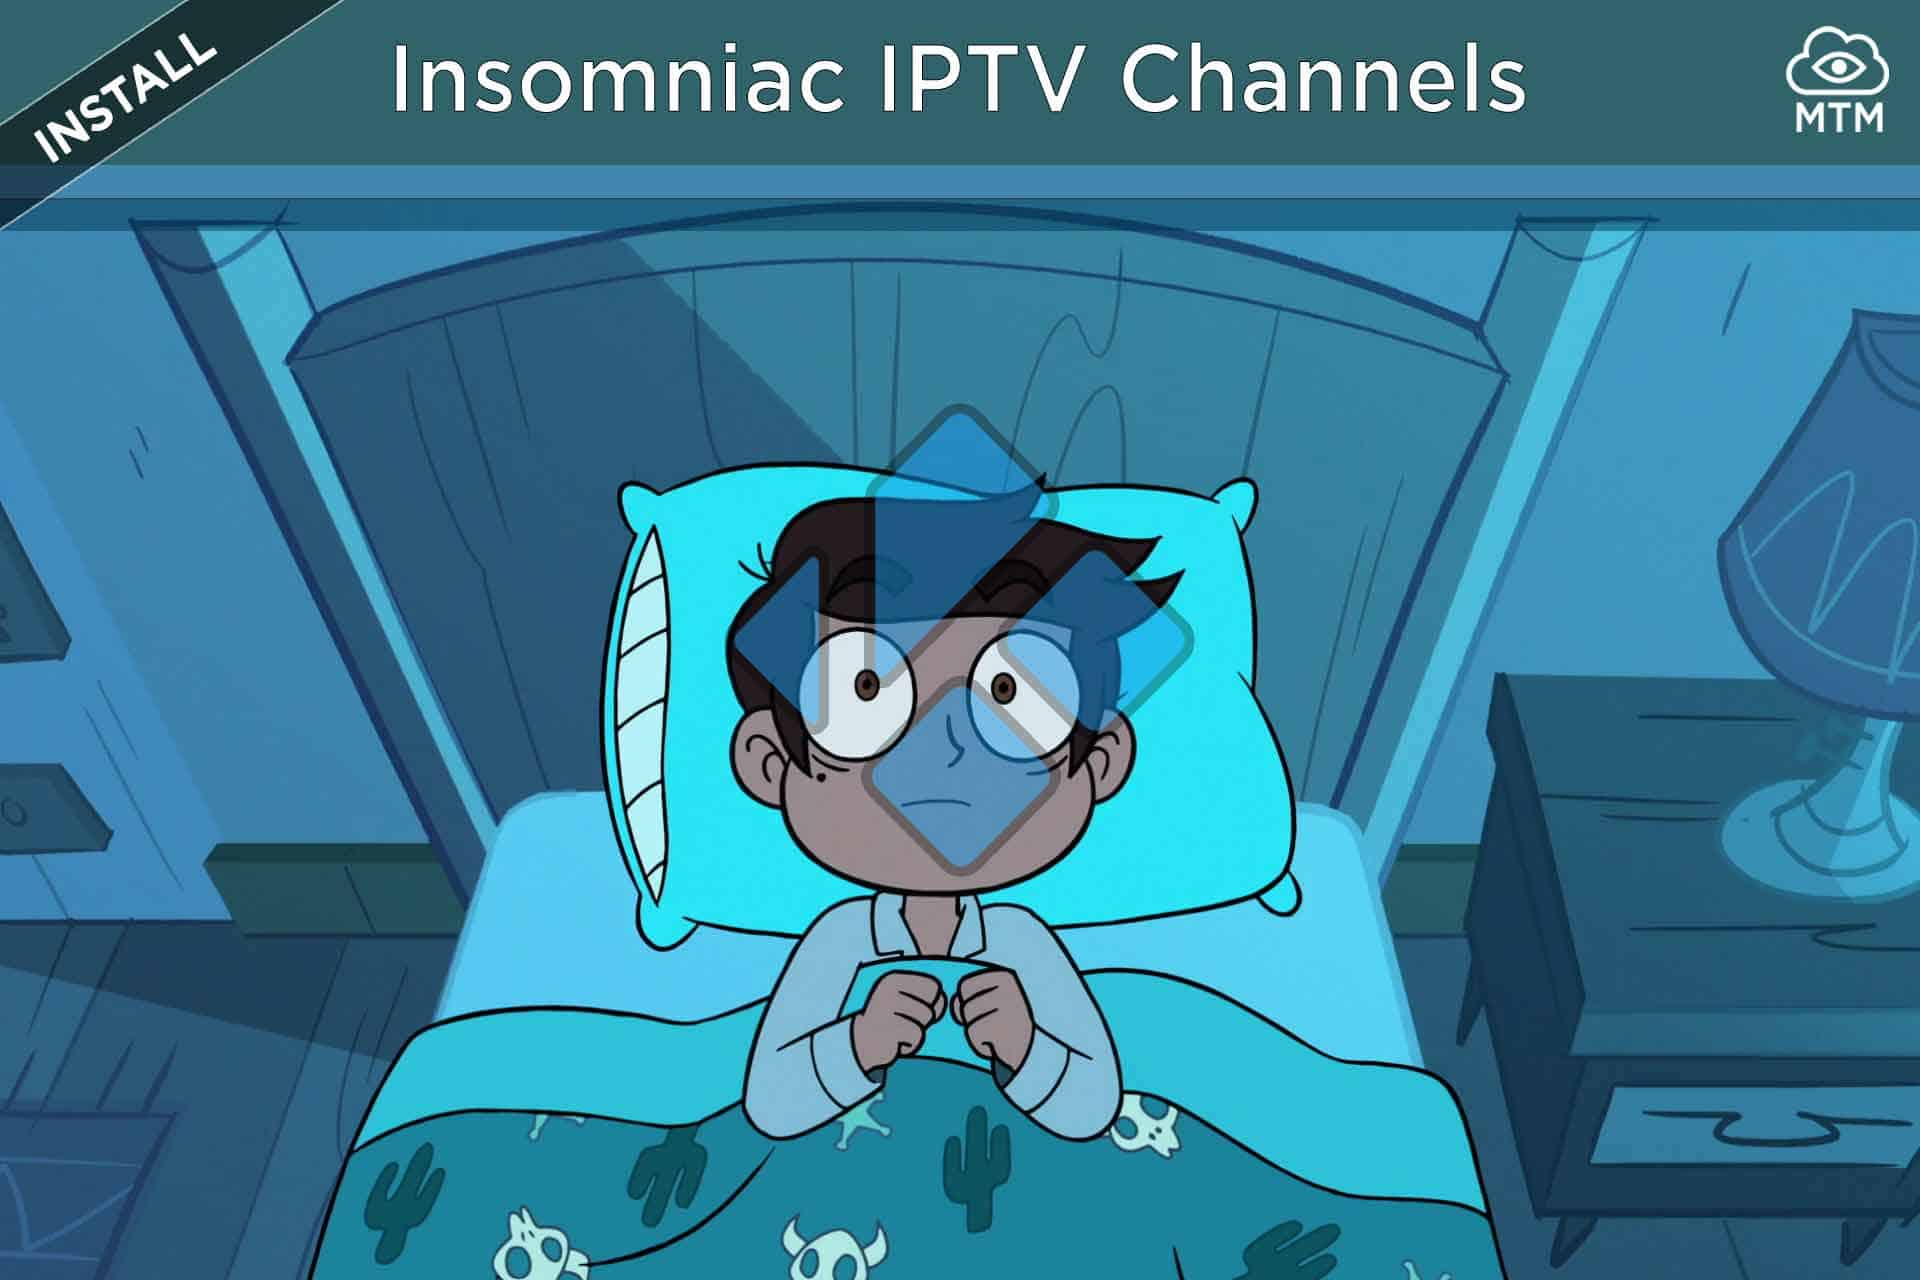 How to Install Insomniac Kodi IPTV Movies & TV Channels